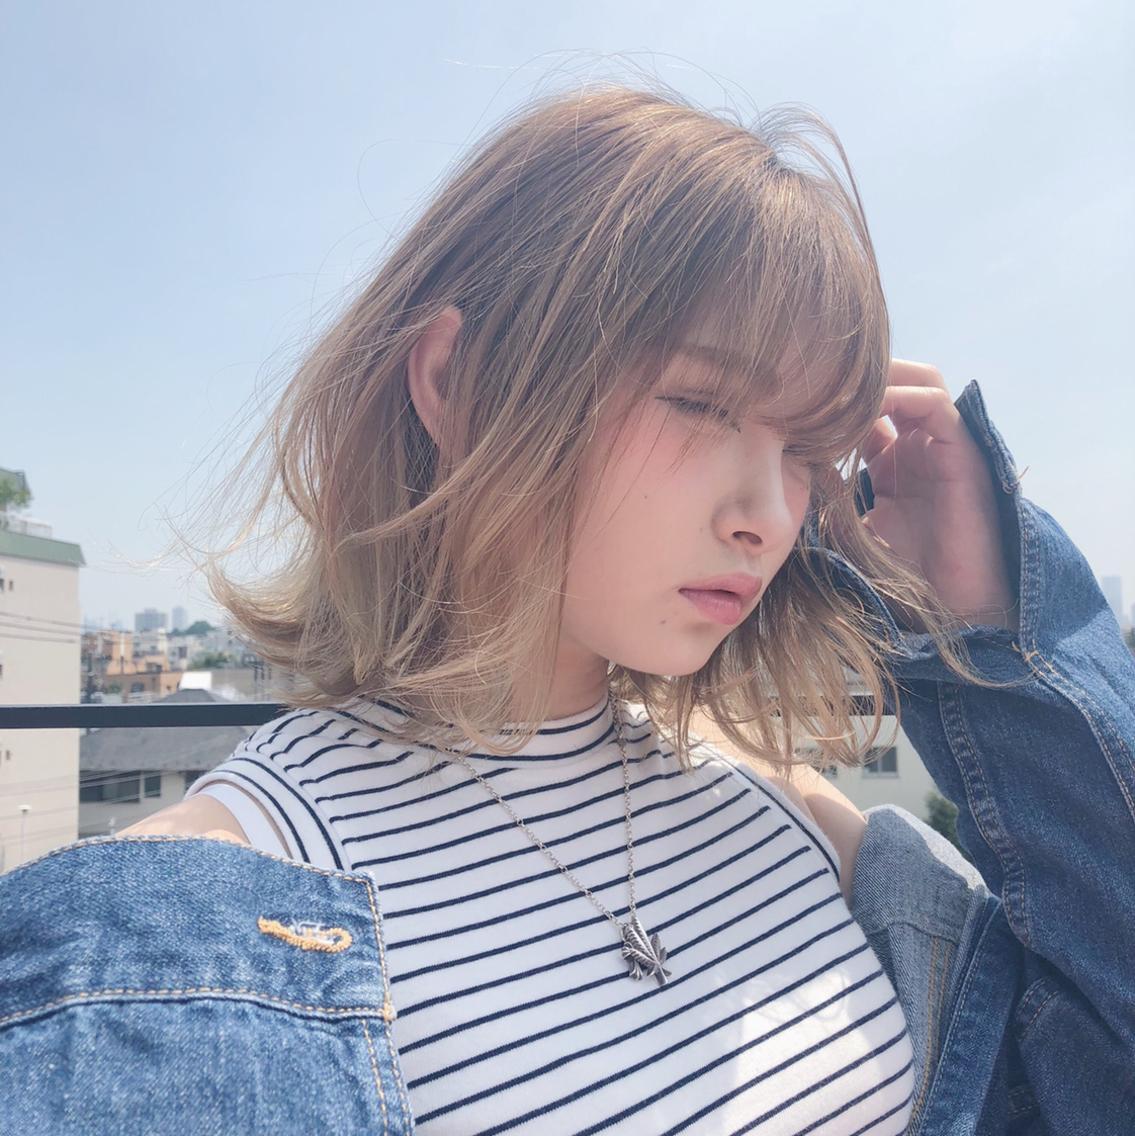 ❤️Tink横浜❤️所属・❤️平田 たかし❤️の掲載